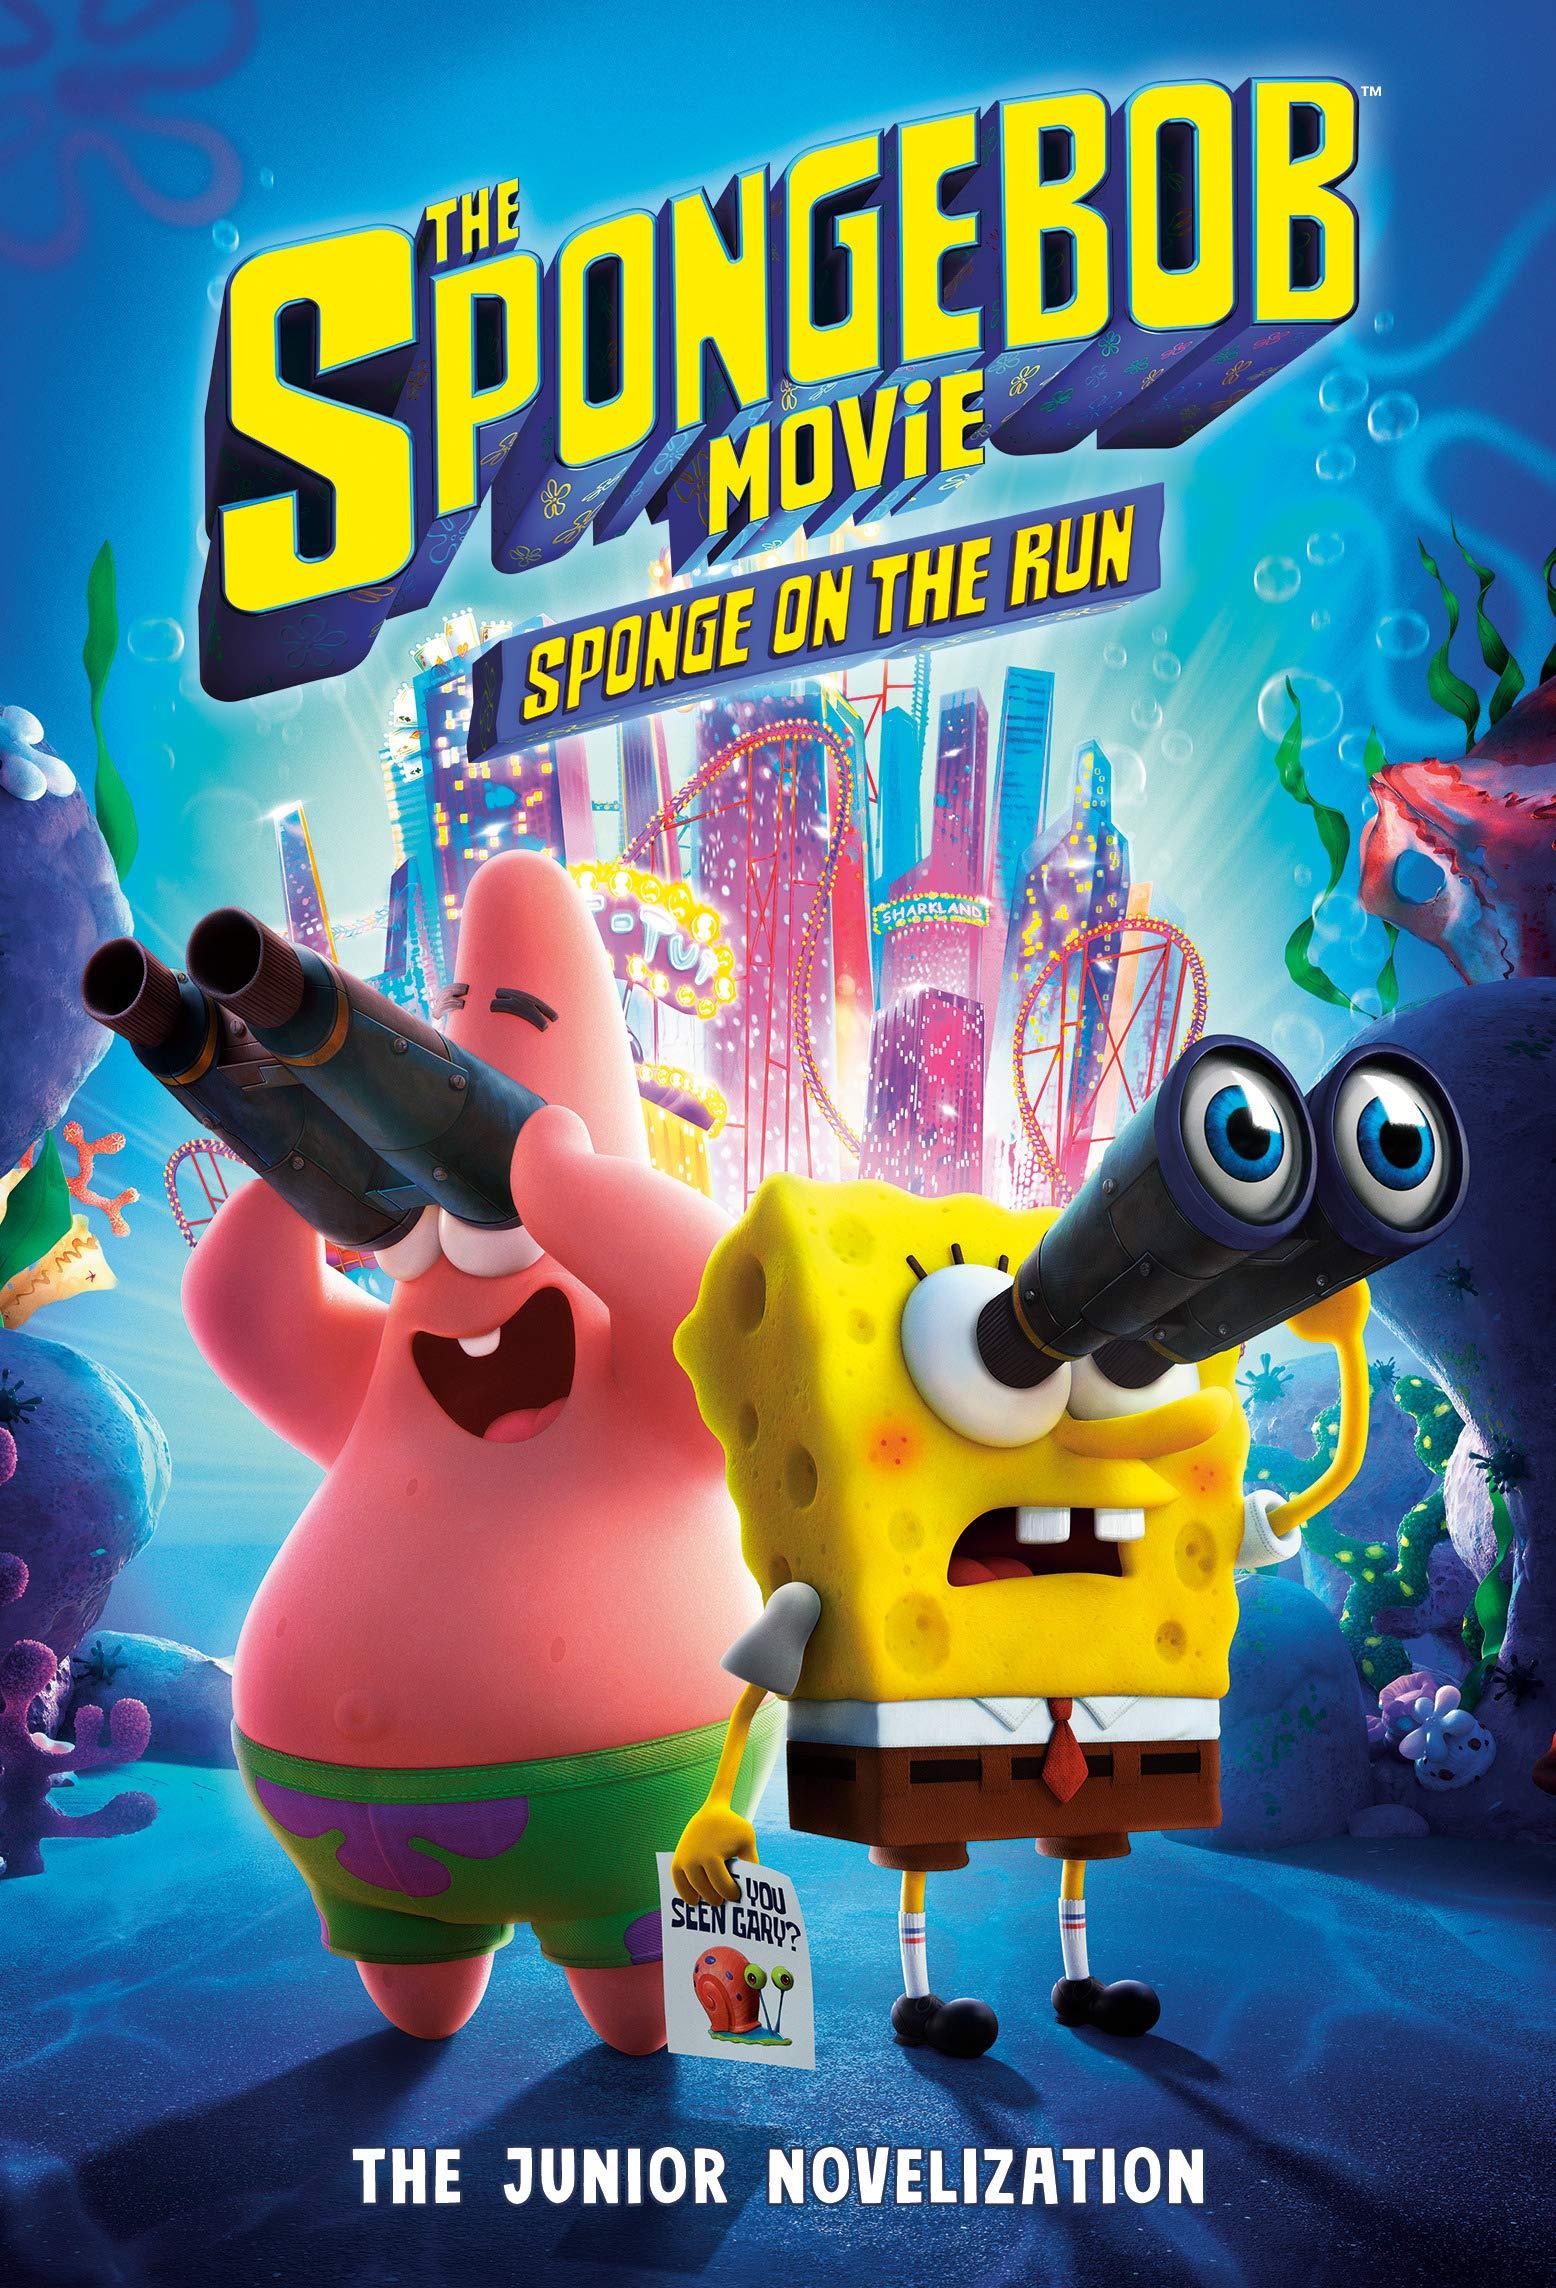 The Spongebob Movie Sponge On The Run The Junior Novelization Spongebob Squarepants Lewman David Random House 9780593127513 Amazon Com Books